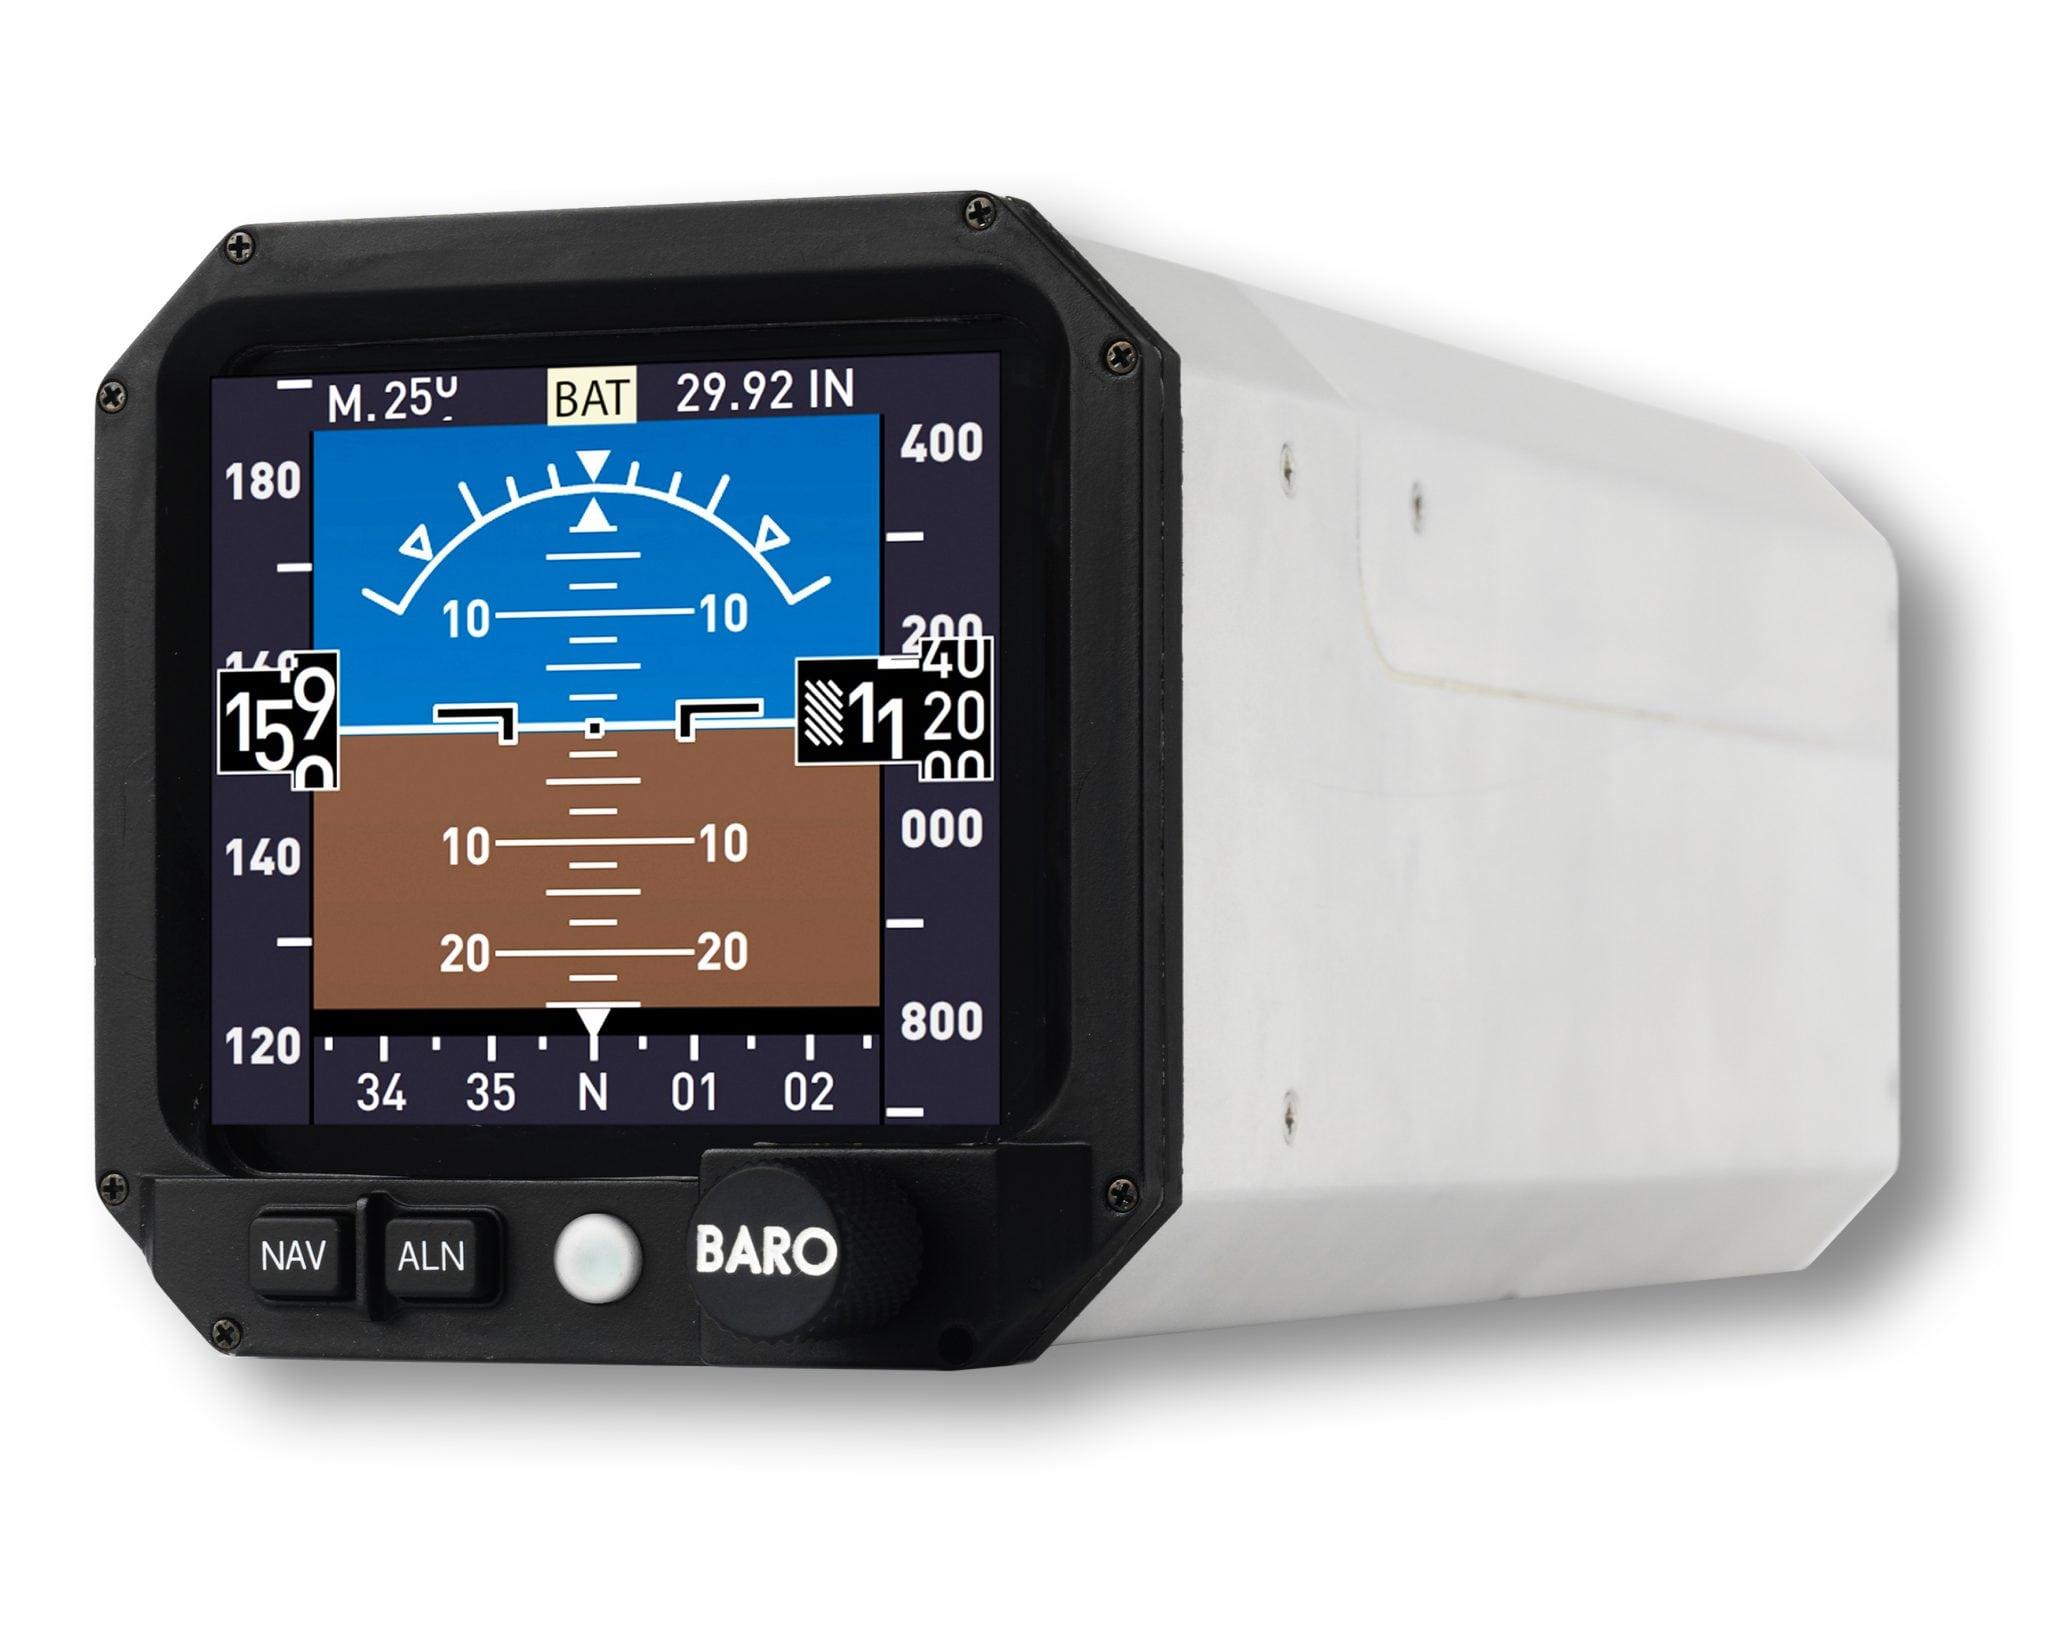 Isfd Front Right Bizjet Comp White Background on Oxygen Sensor Problems